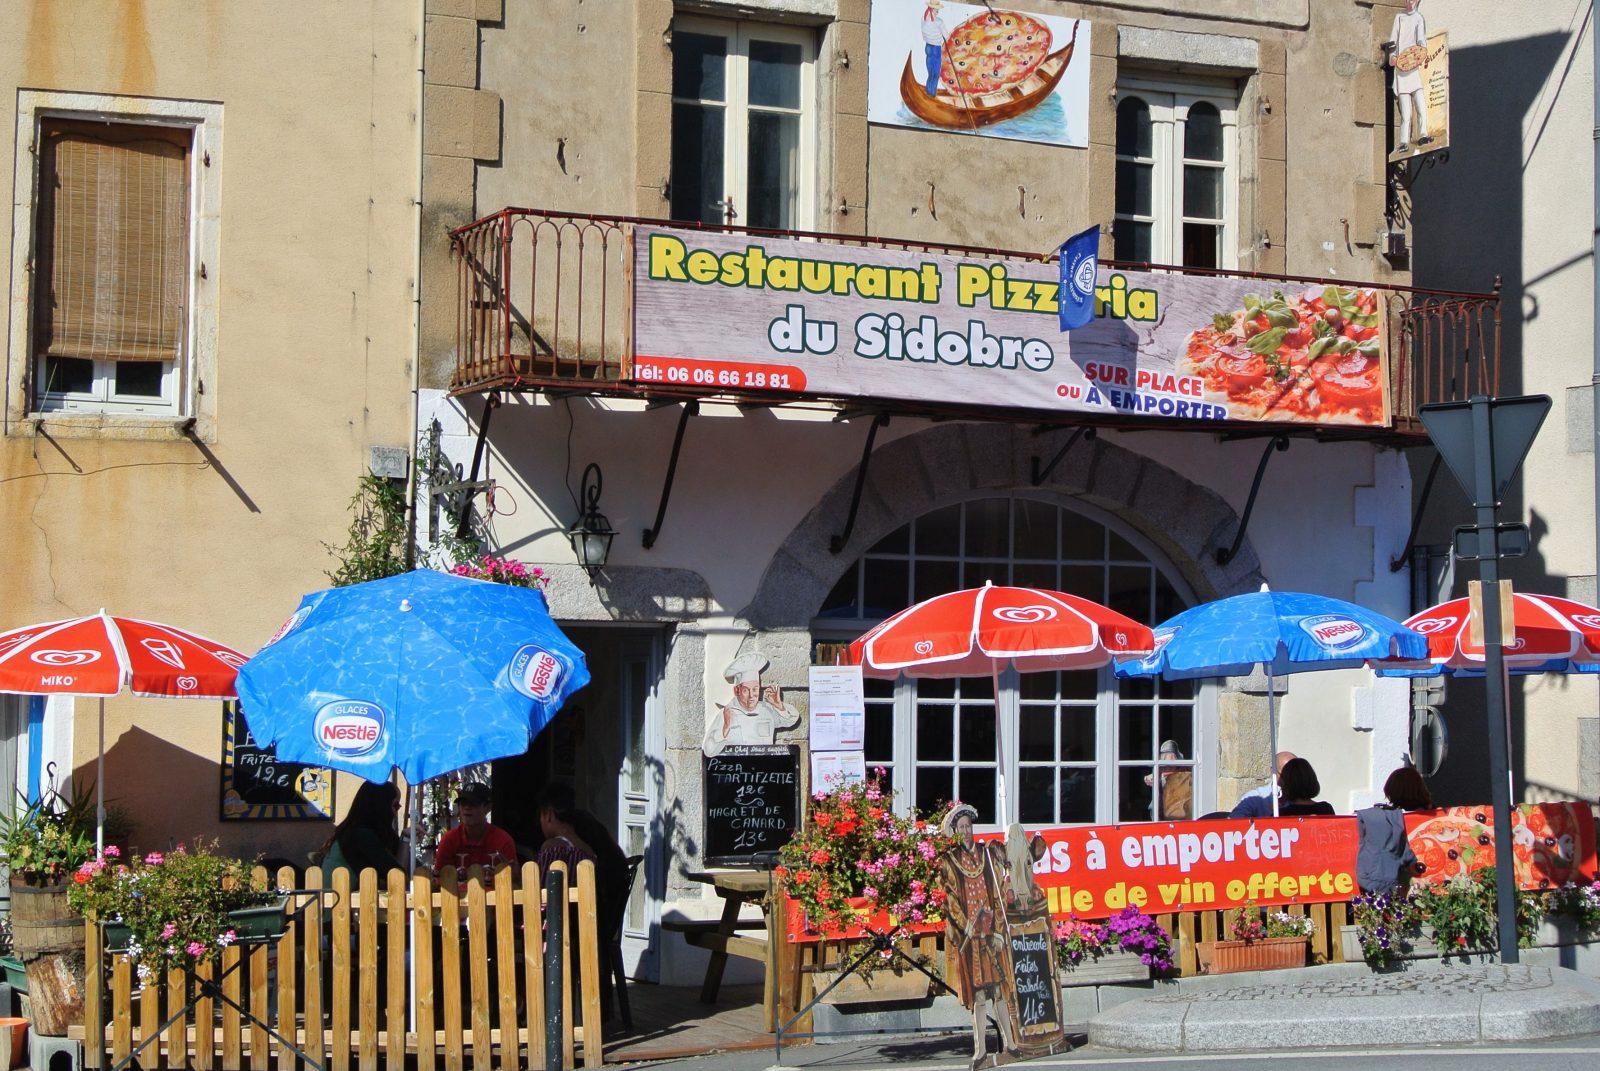 Pizzeria du Sidobre